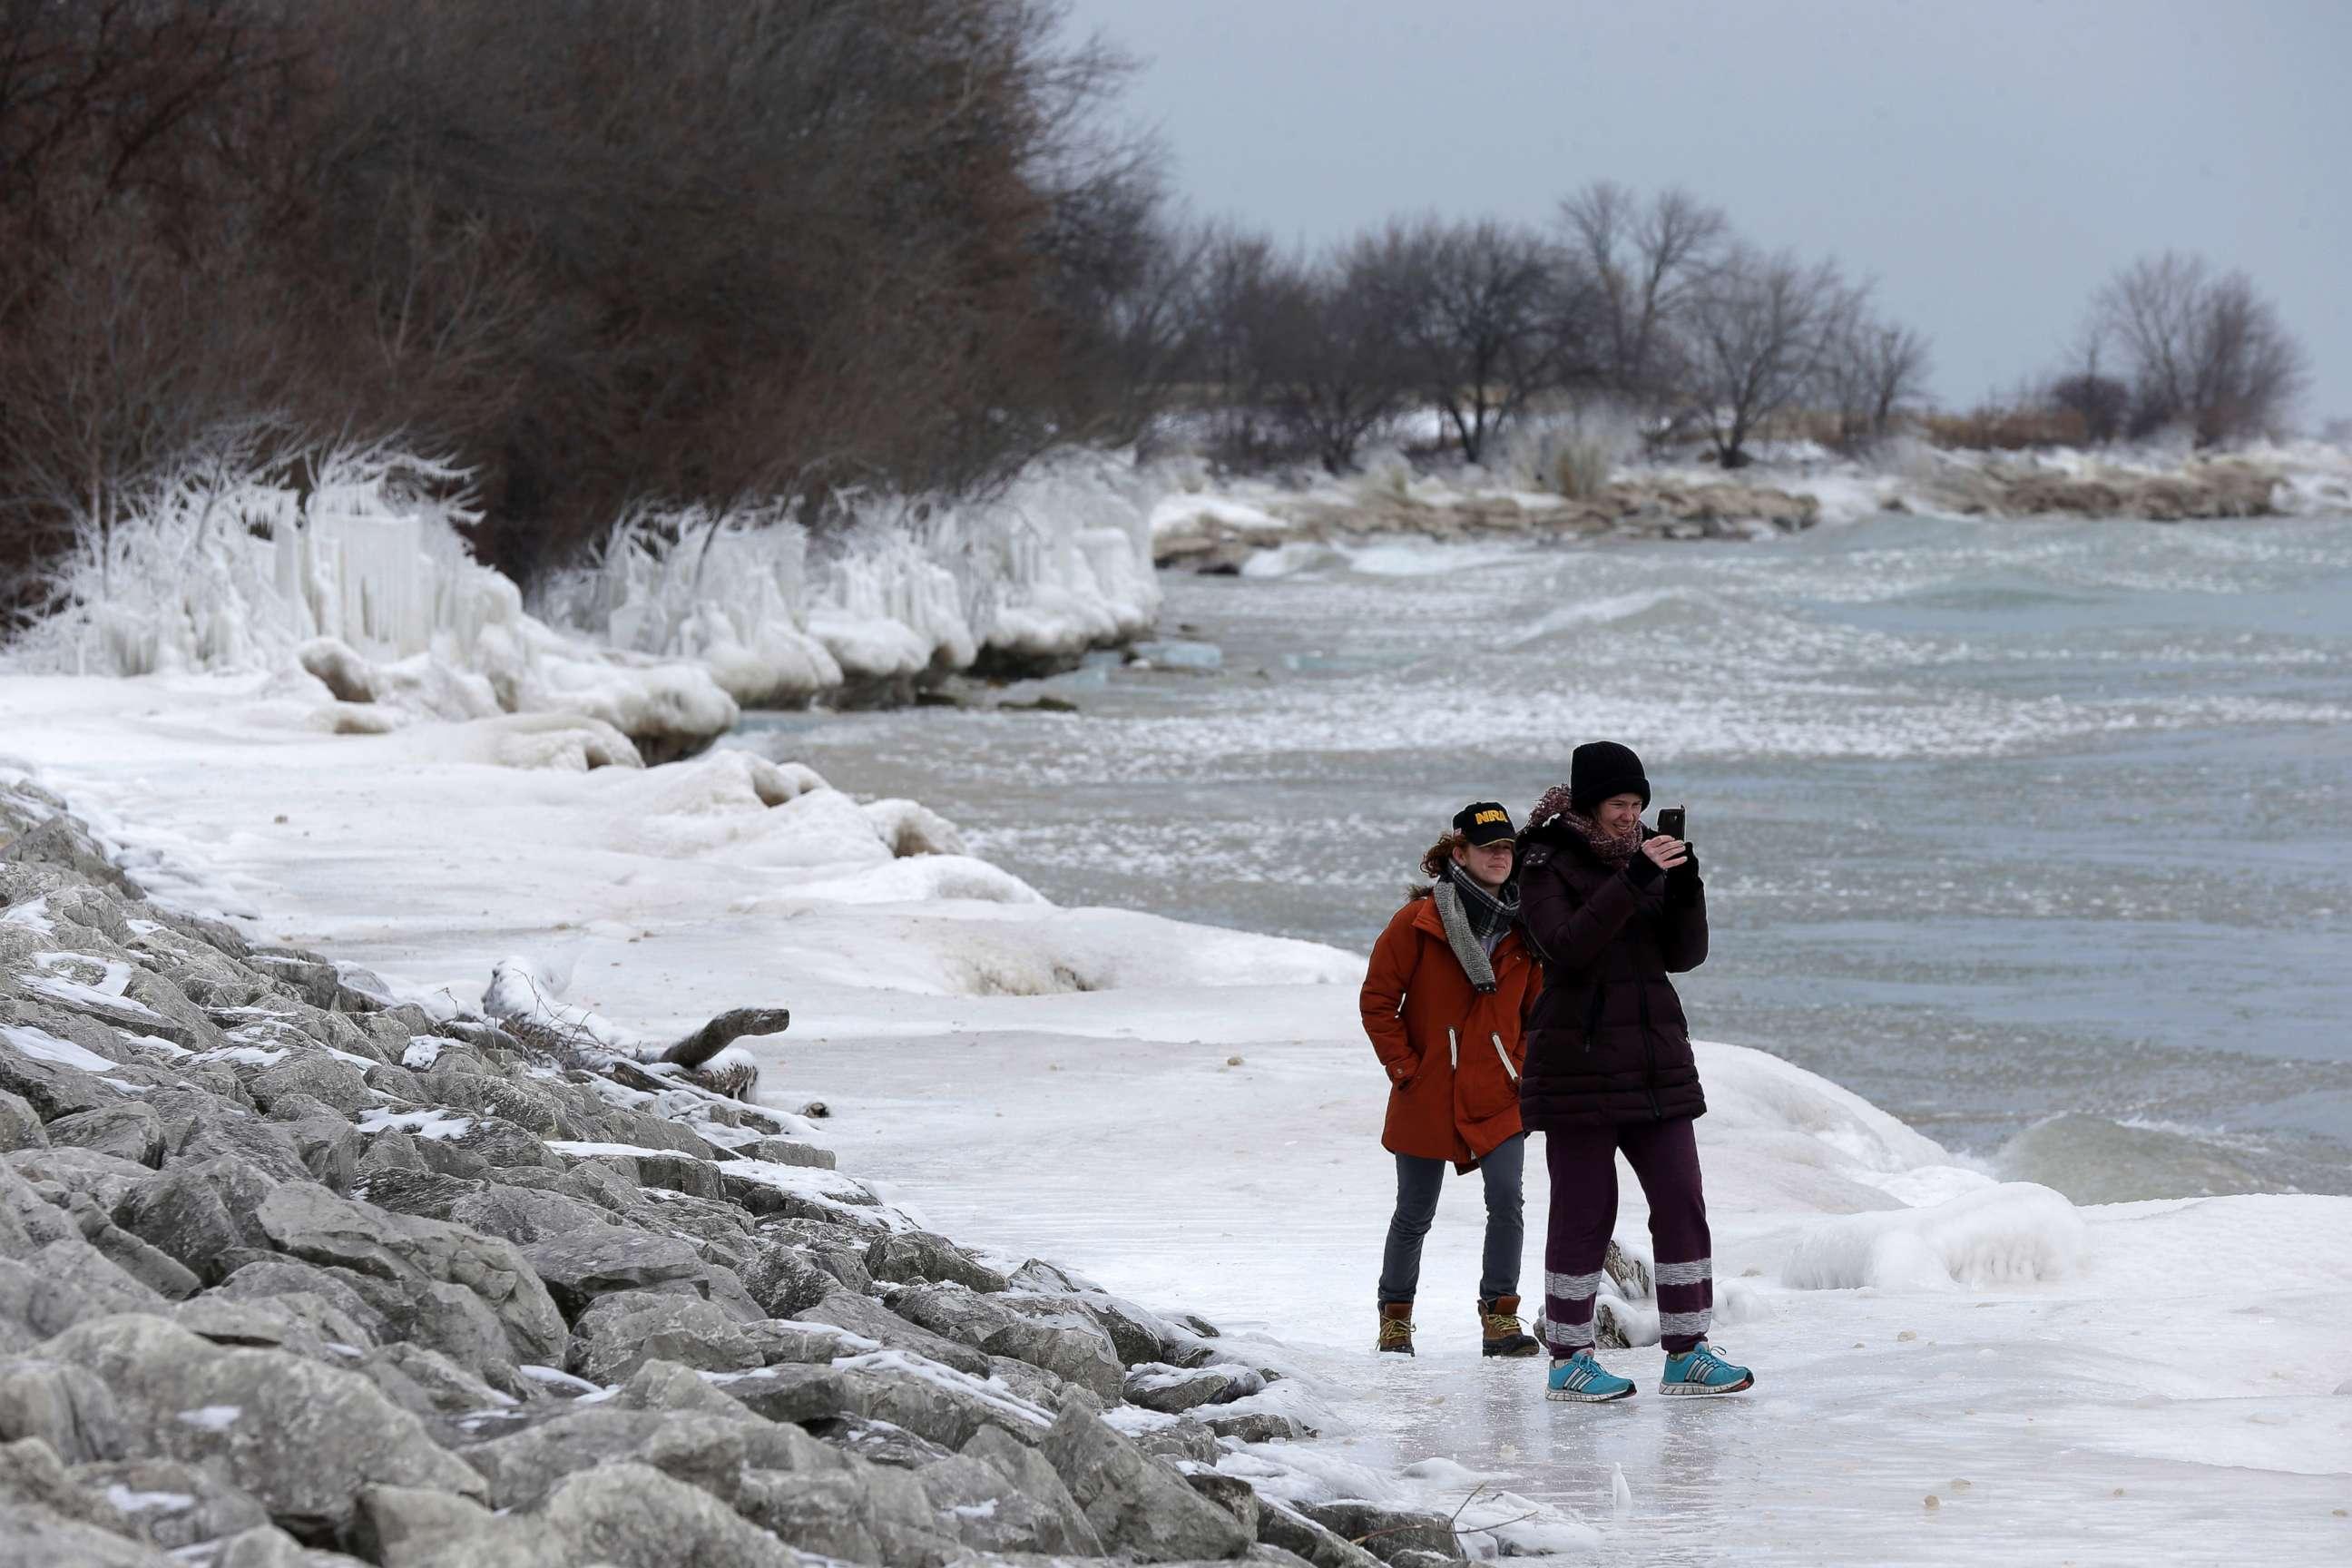 https://i2.wp.com/abcnews.go.com/images/US/winter-weather-wisconsin-ap-jt-180107.jpg